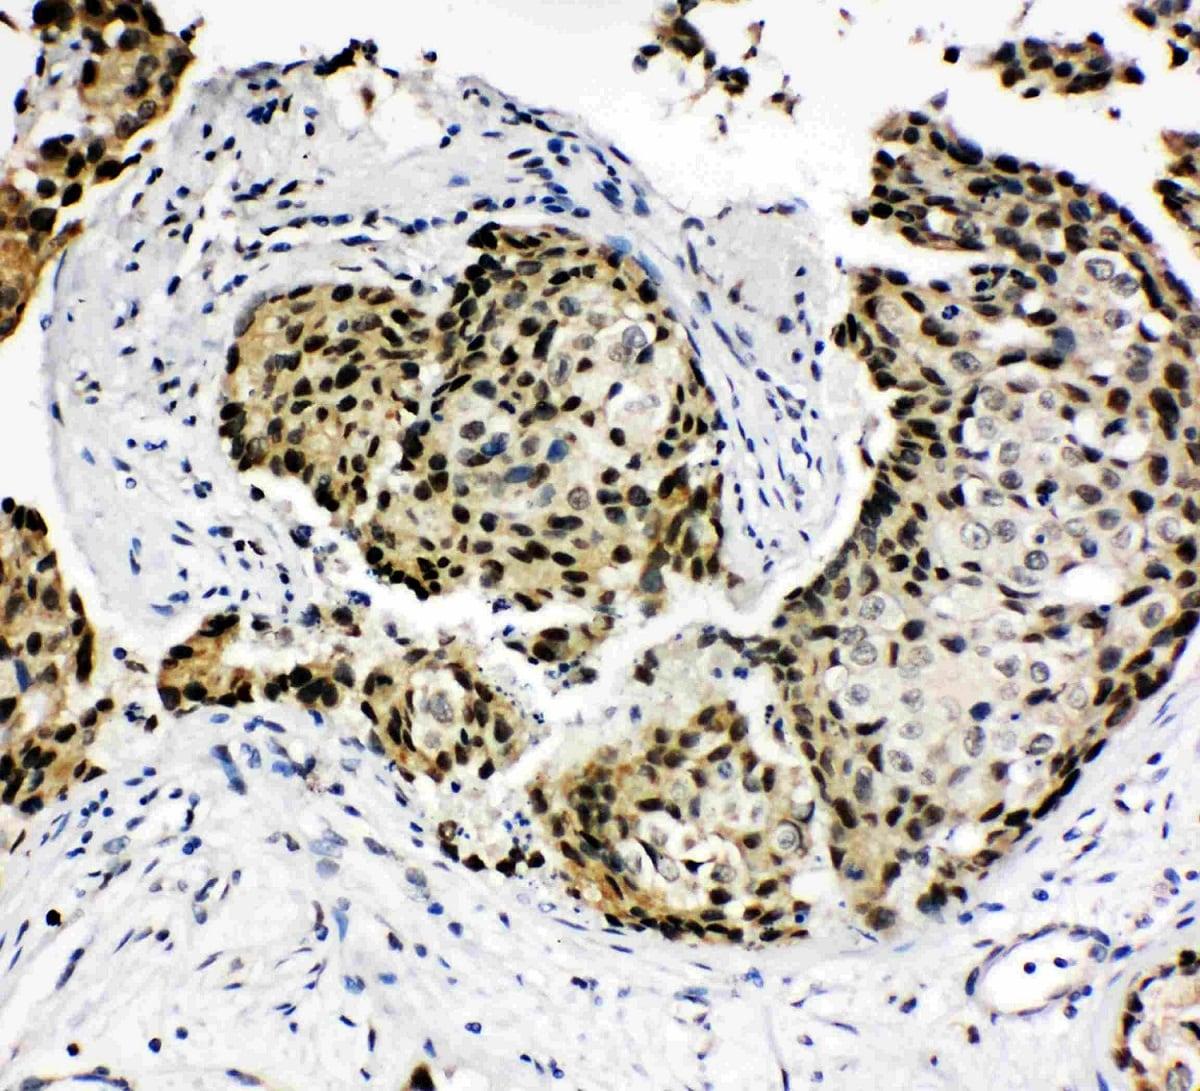 Immunohistochemistry (Formalin/PFA-fixed paraffin-embedded sections) - Anti-HOXA4 antibody (ab131049)